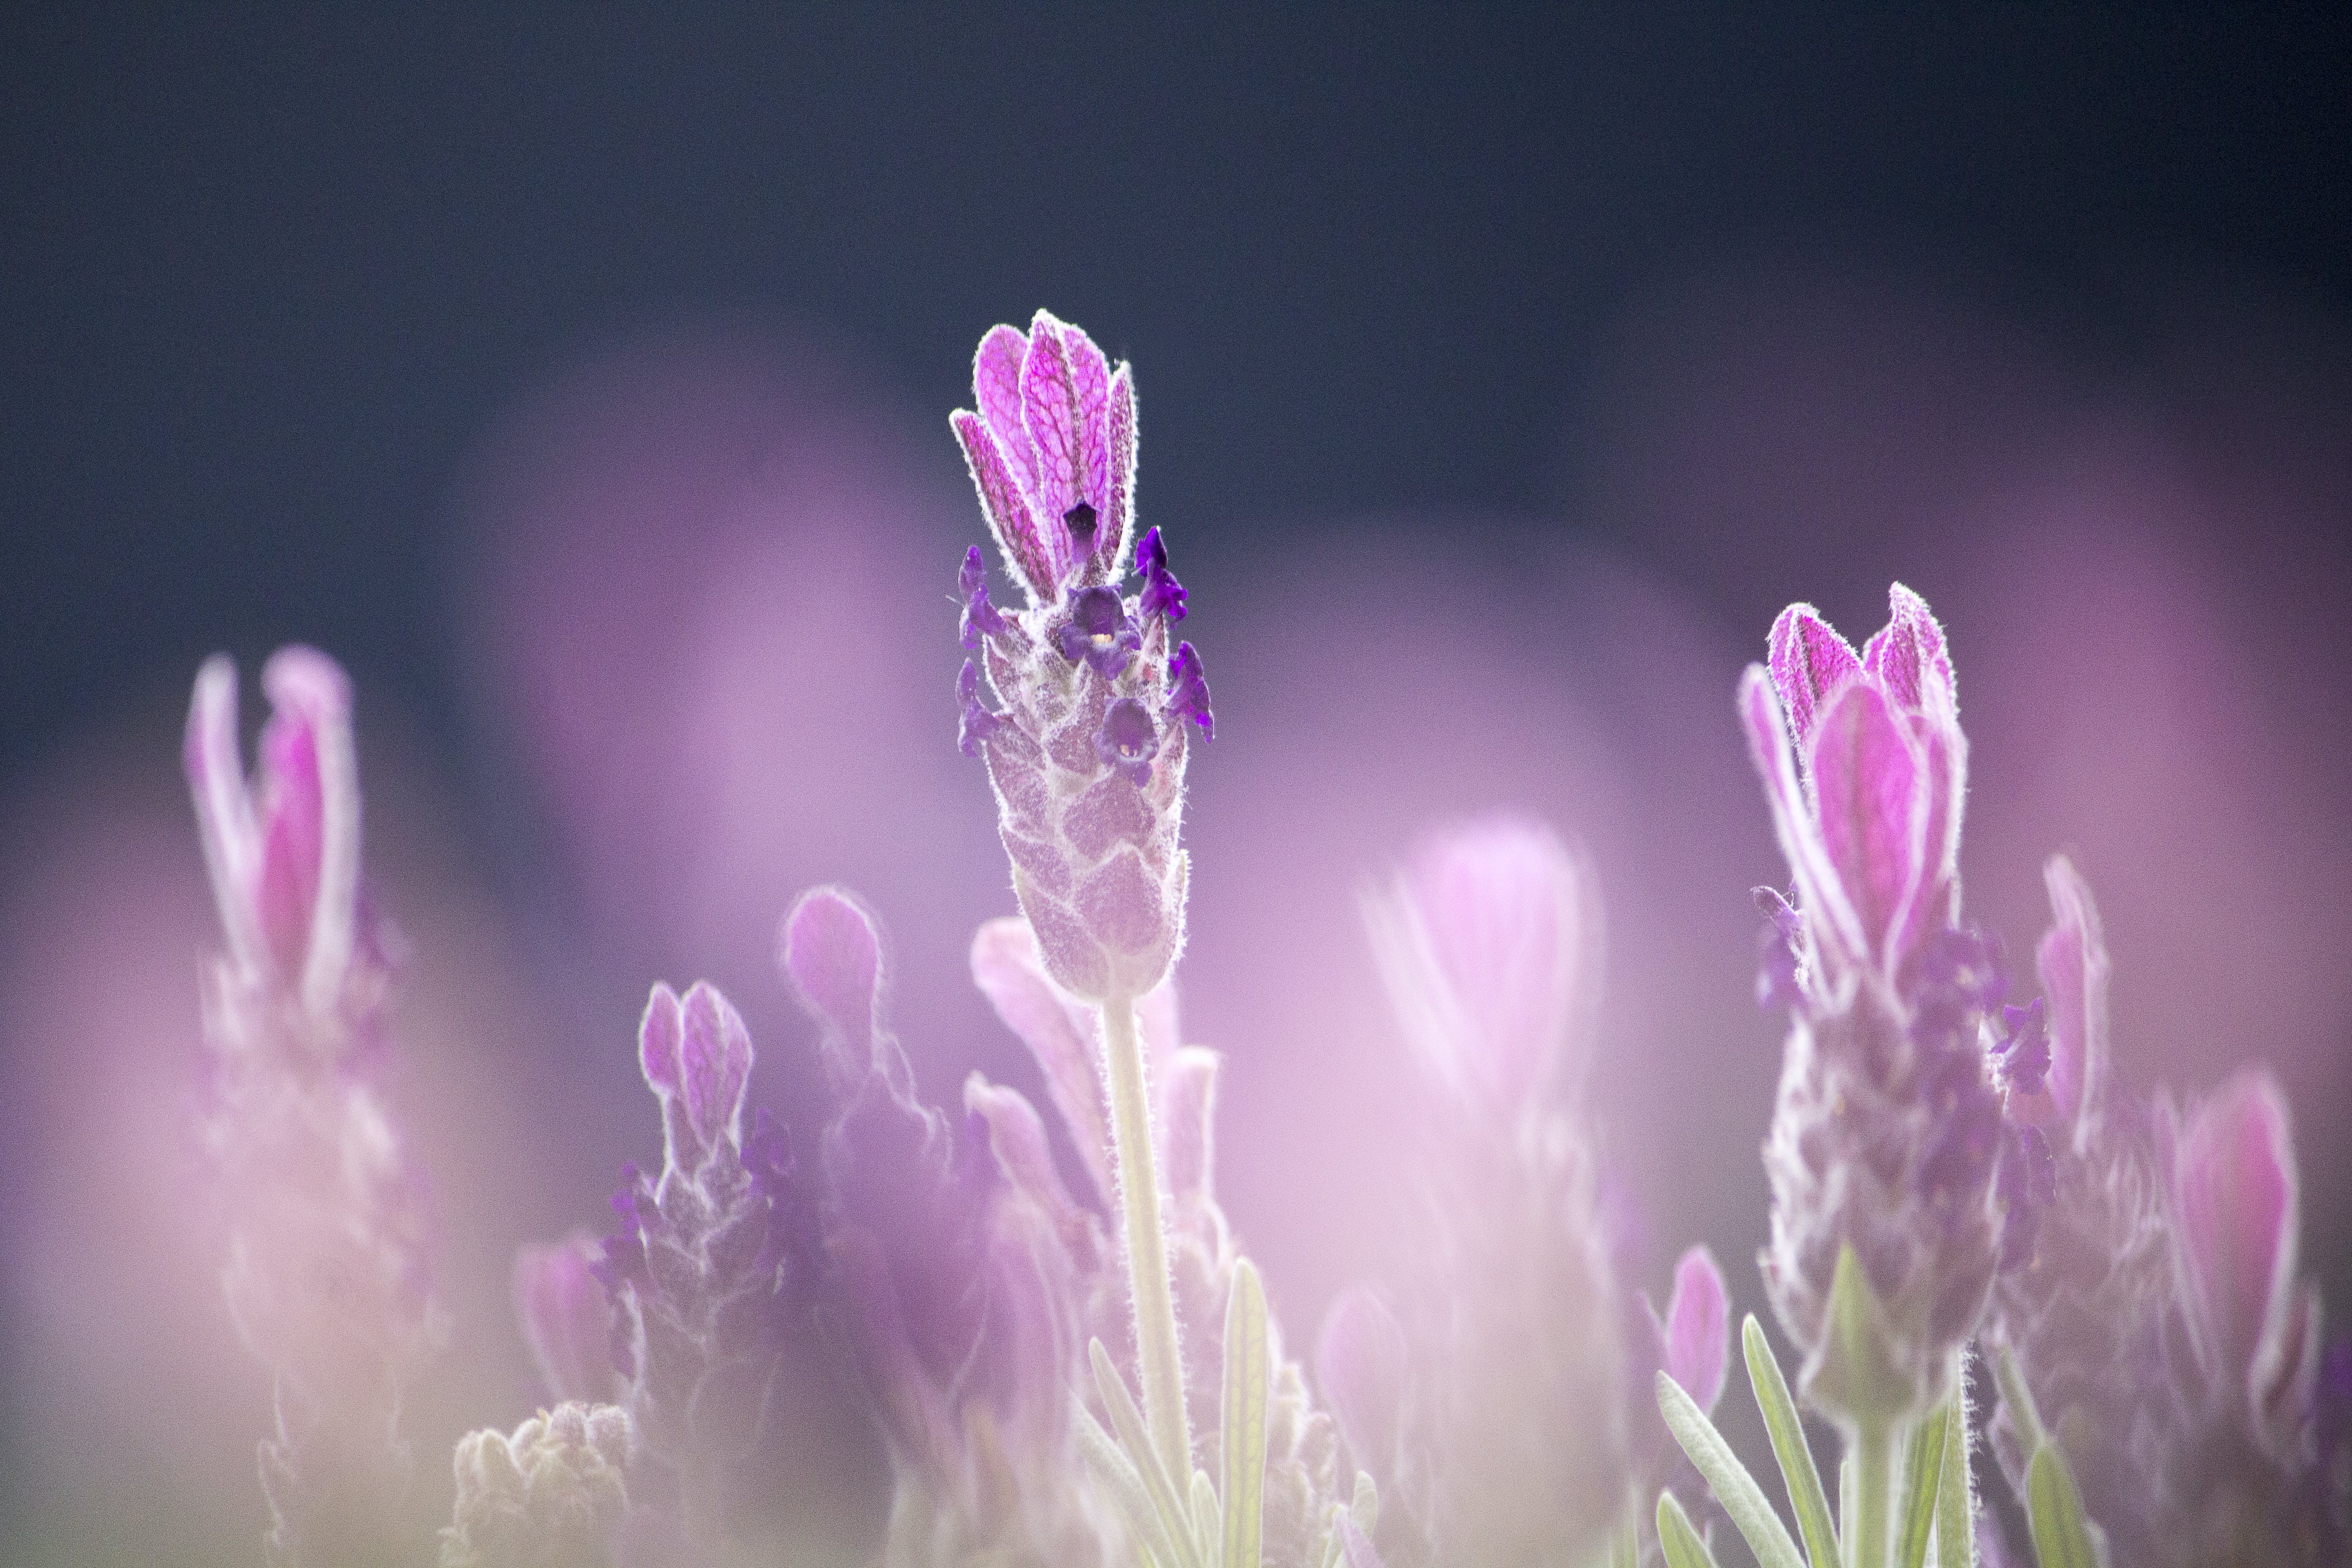 Free stock photo of summer, garden, petals, blur